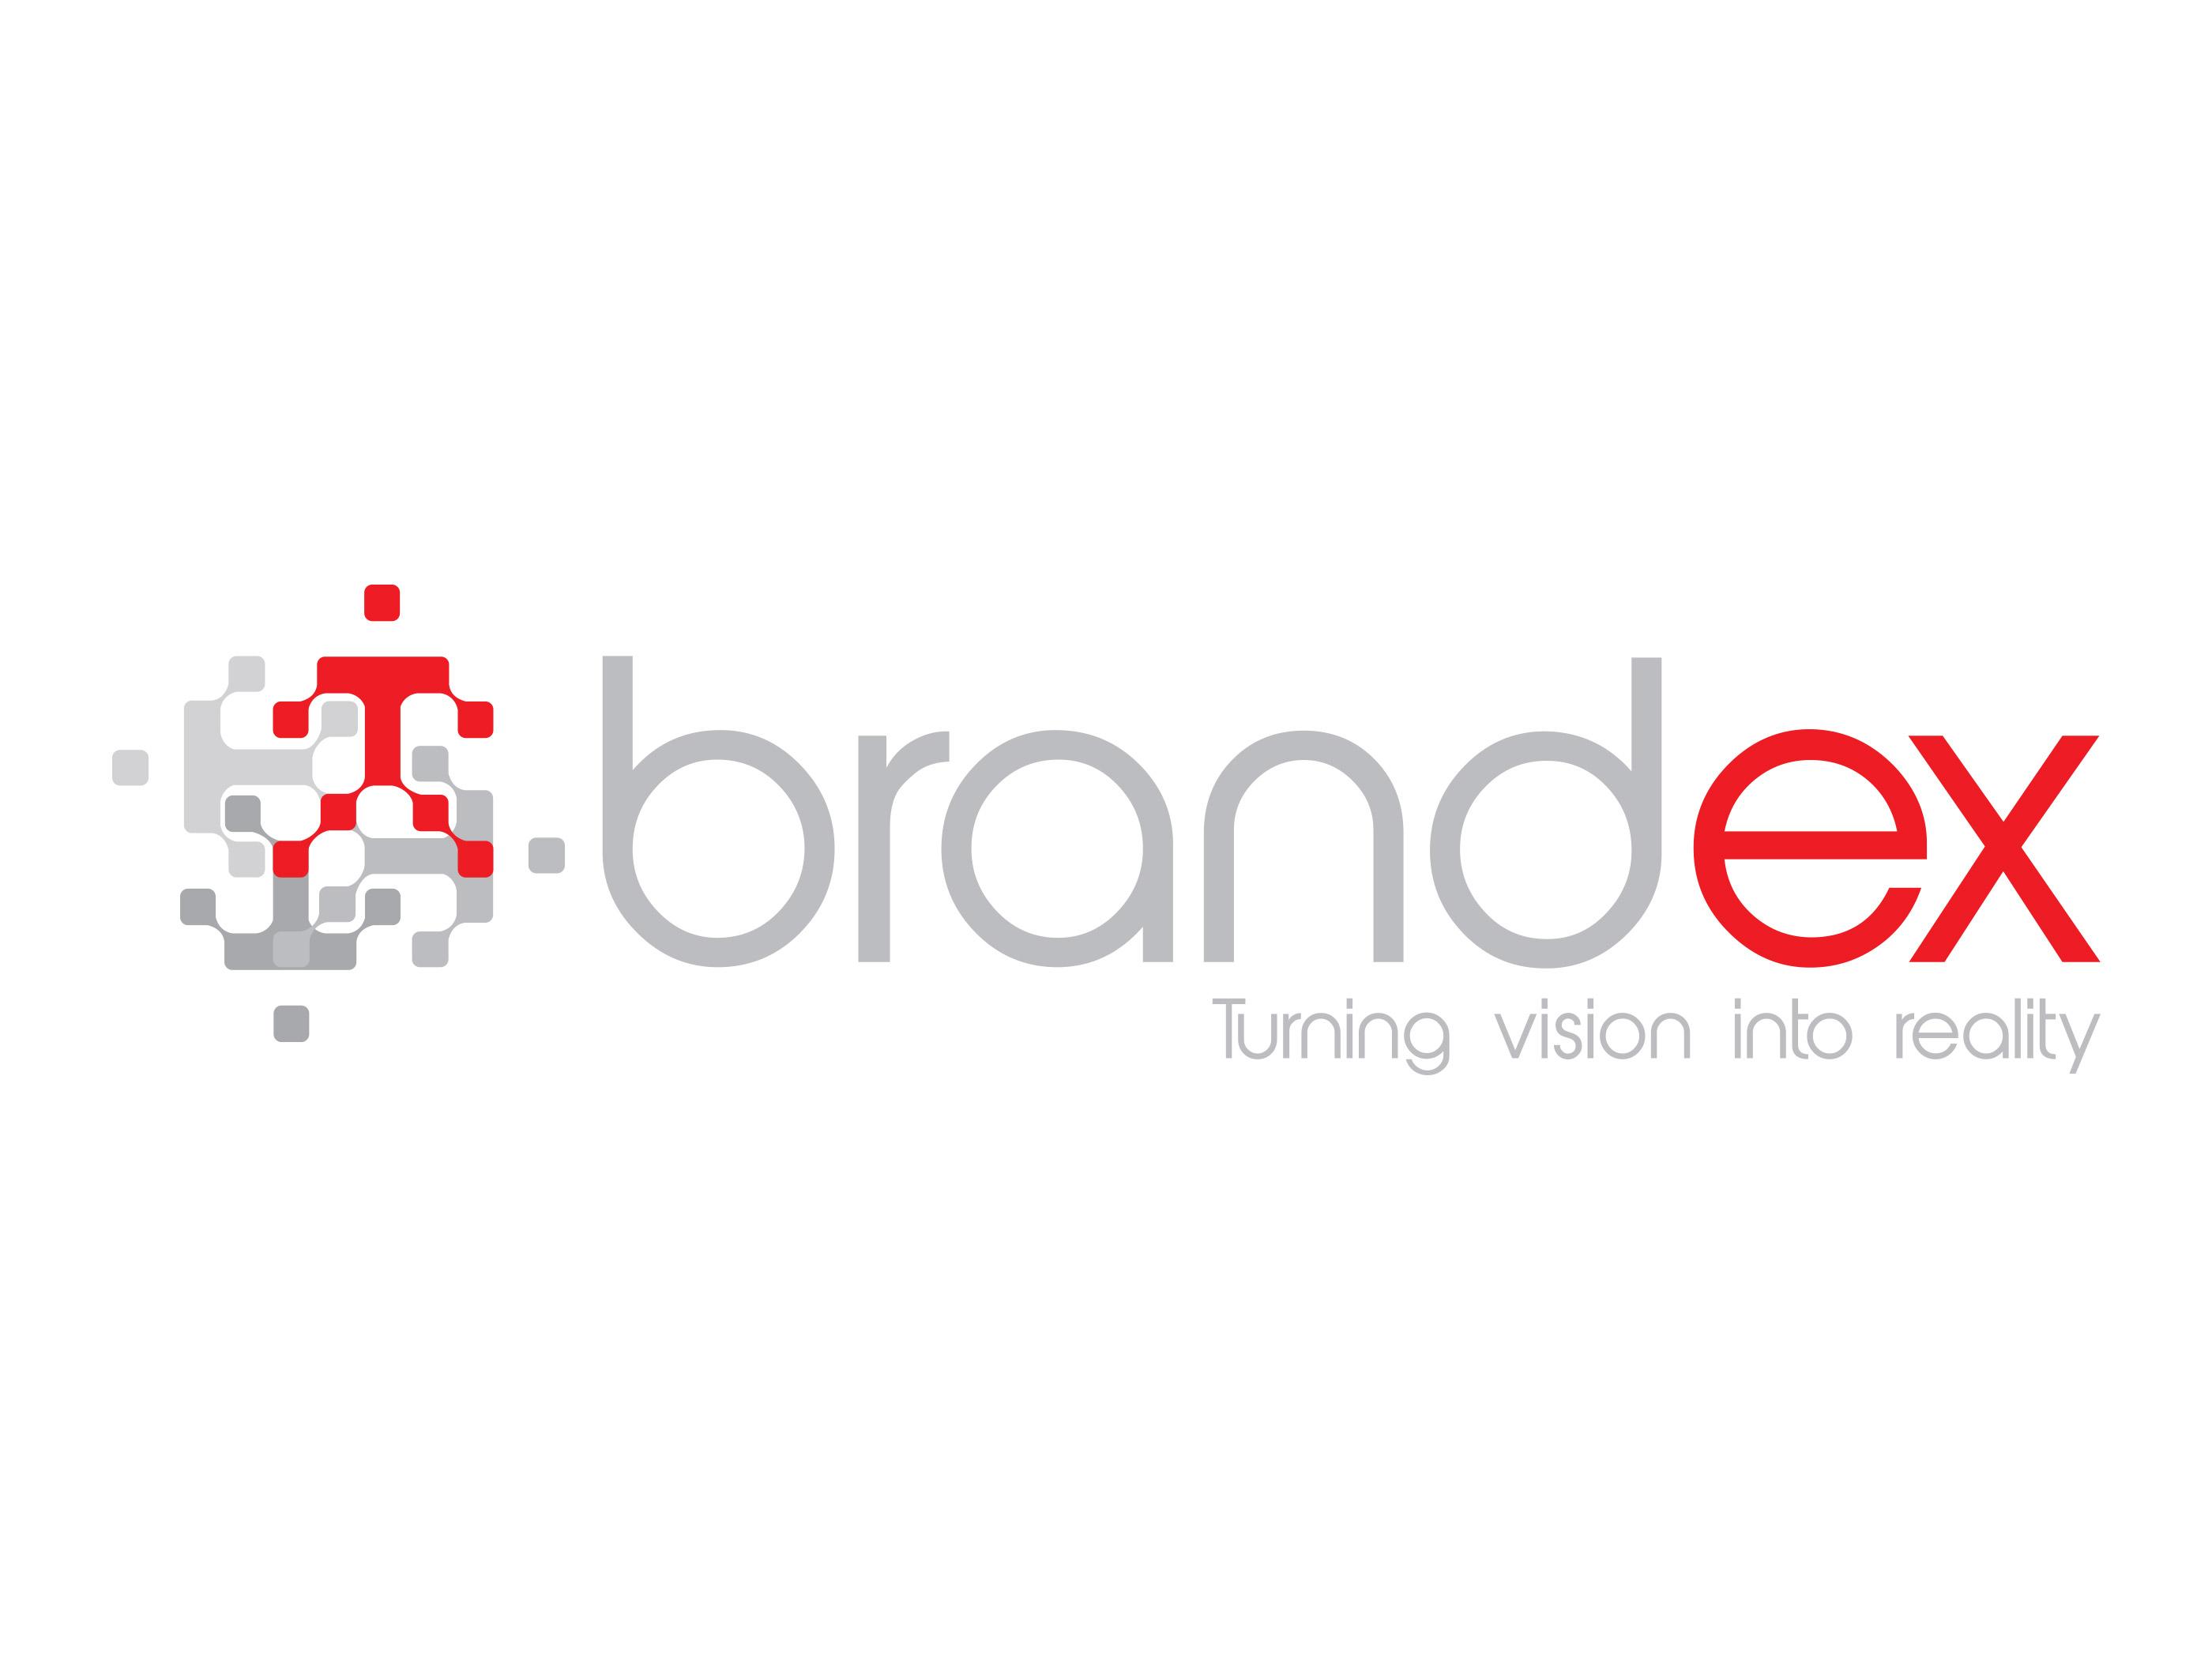 Brandex - Visual Identity